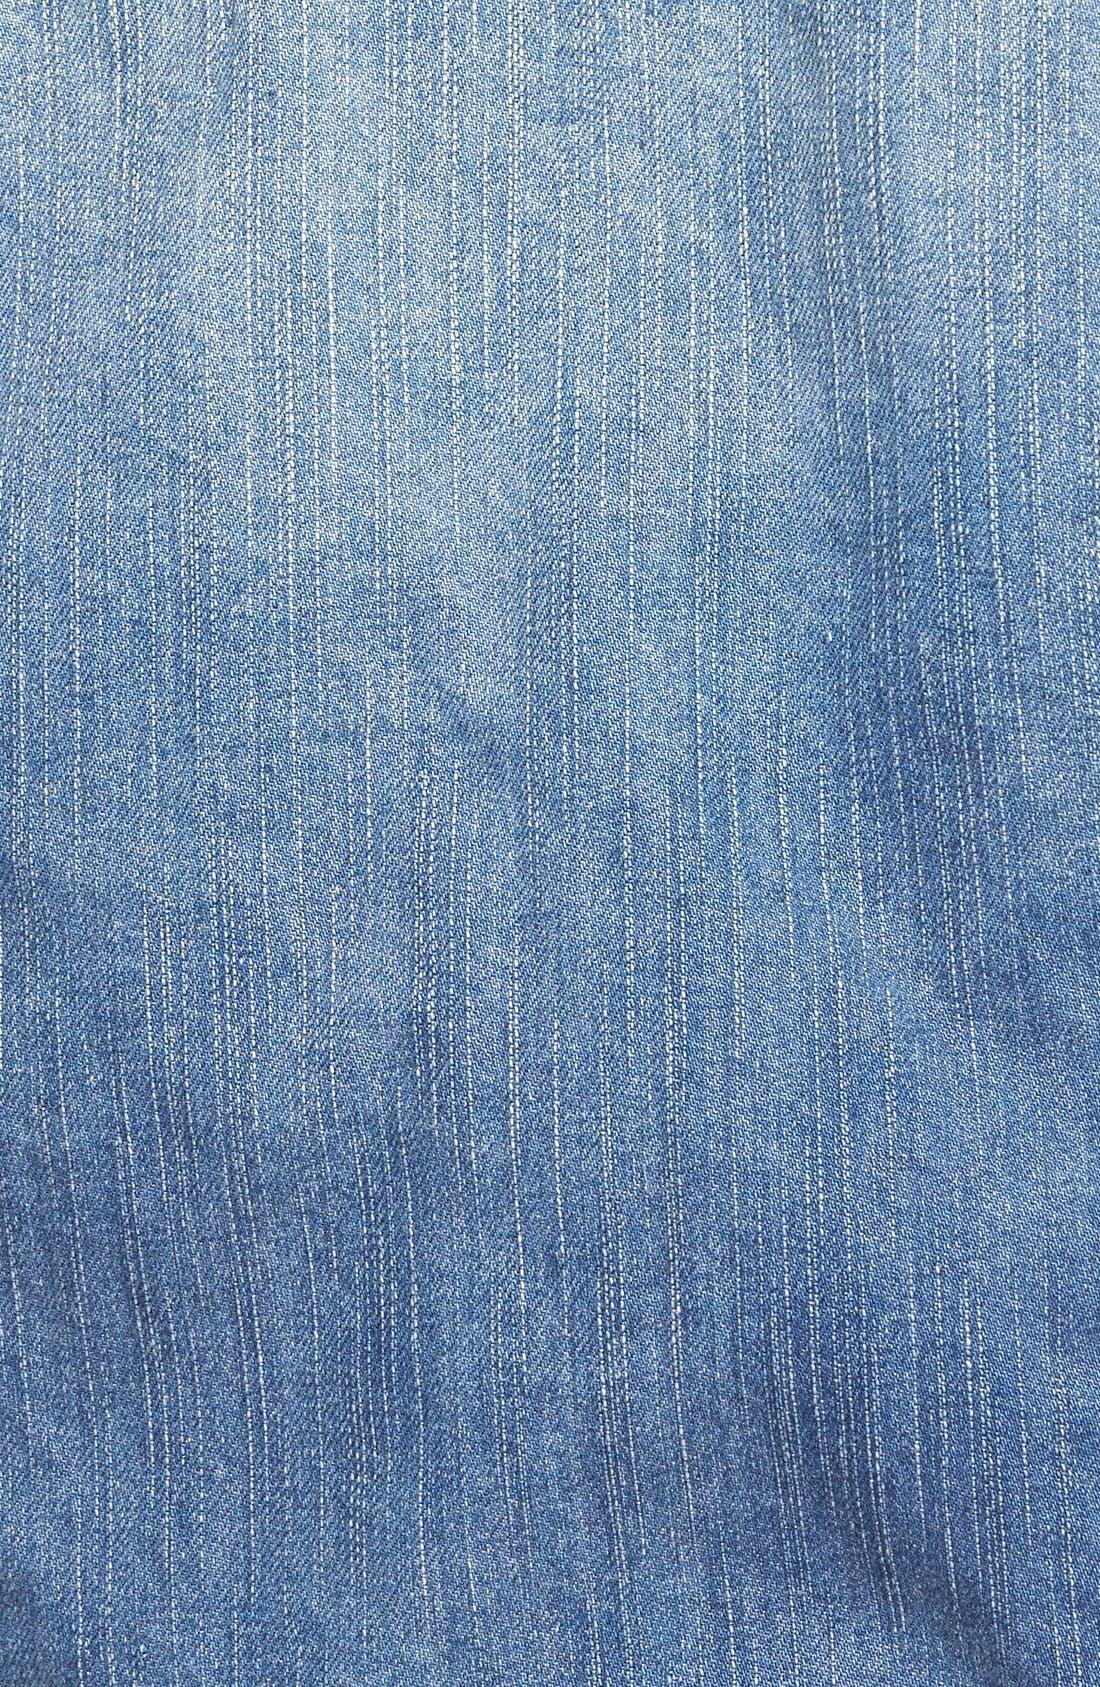 Alternate Image 4  - Thread & Supply 'Santa Fe' Denim Jacket (Juniors)